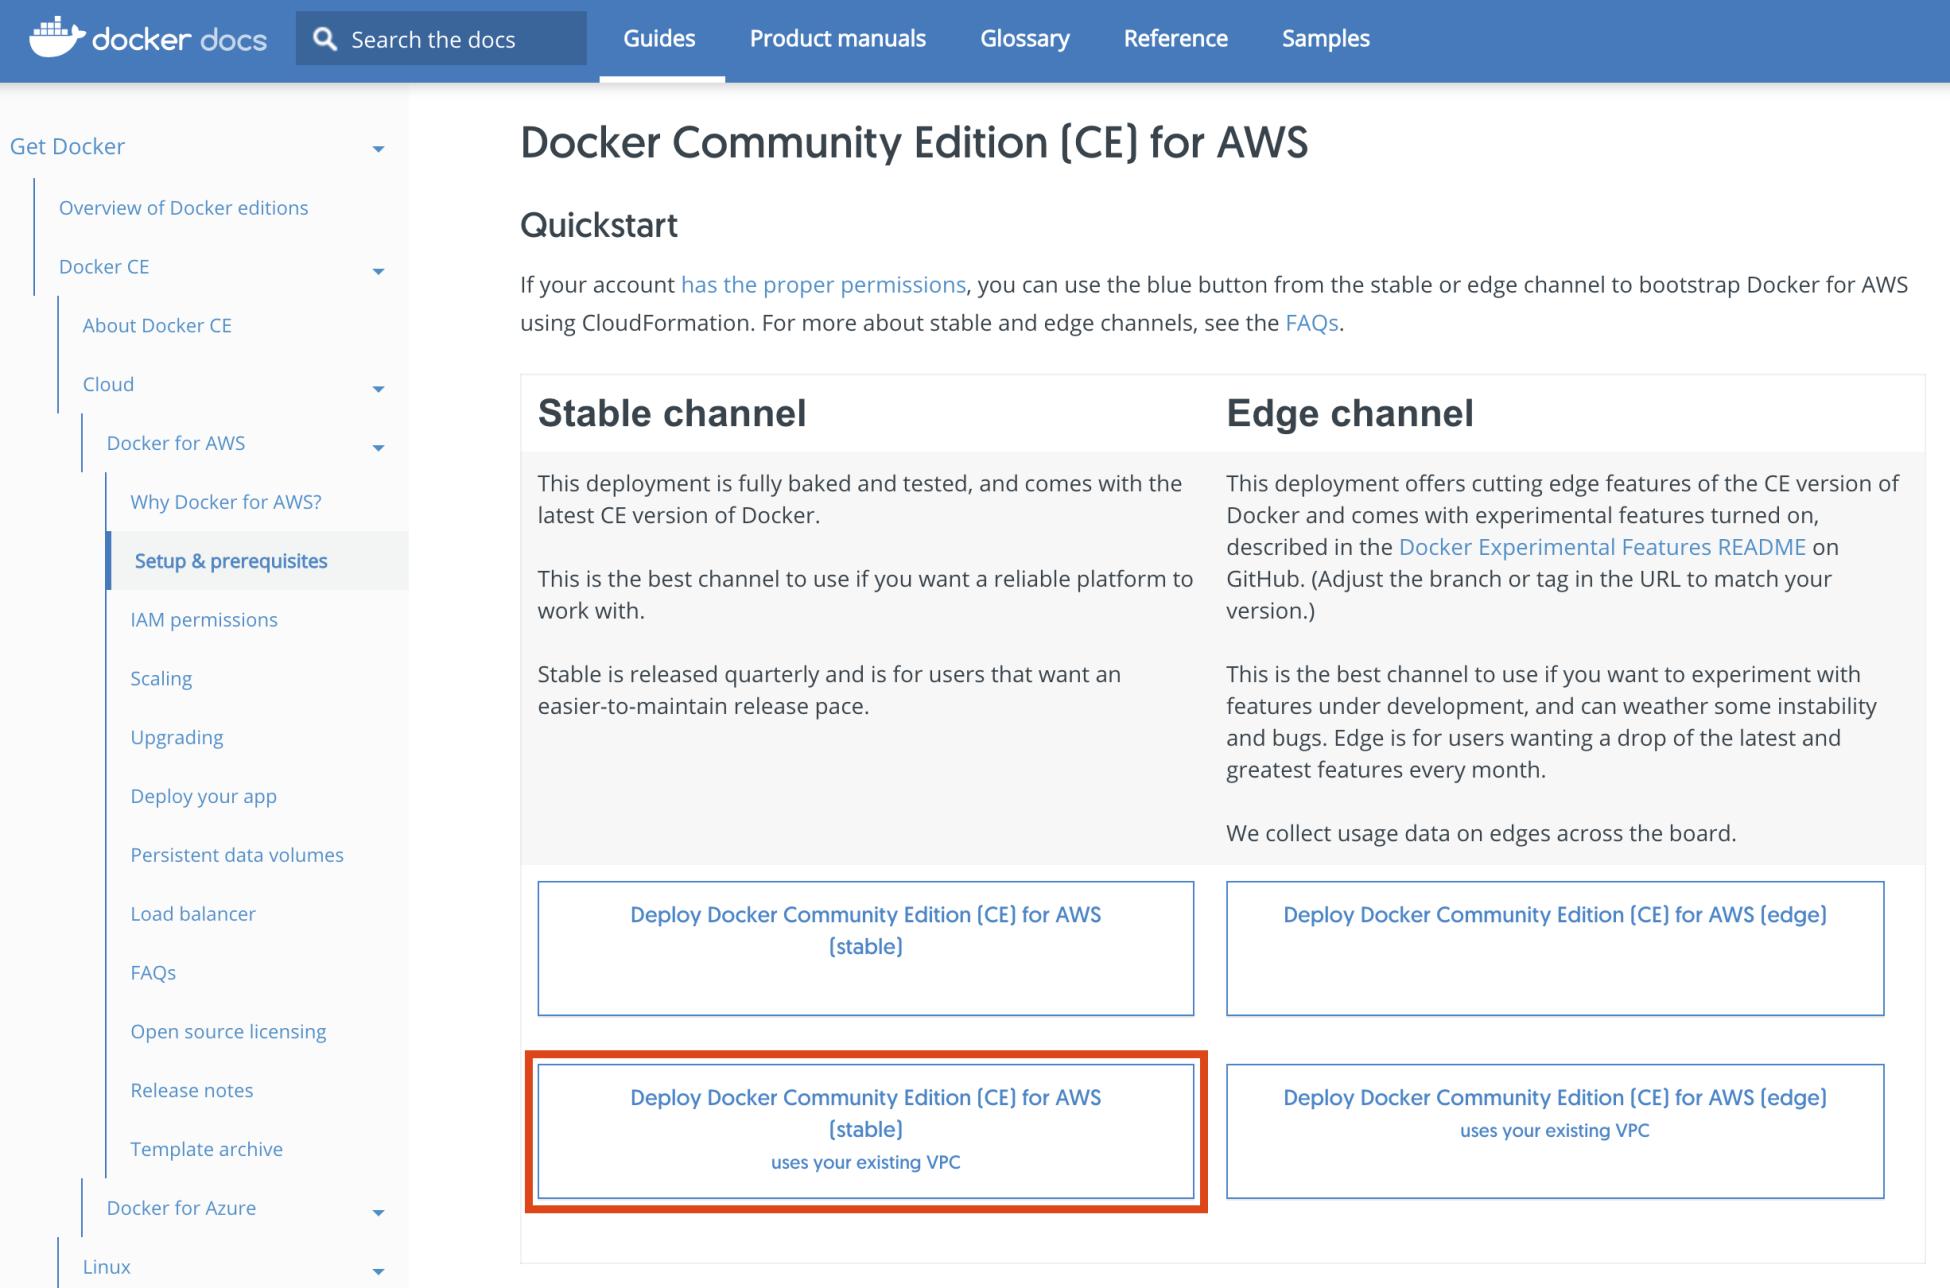 Installing Docker for AWS - Docker on Amazon Web Services